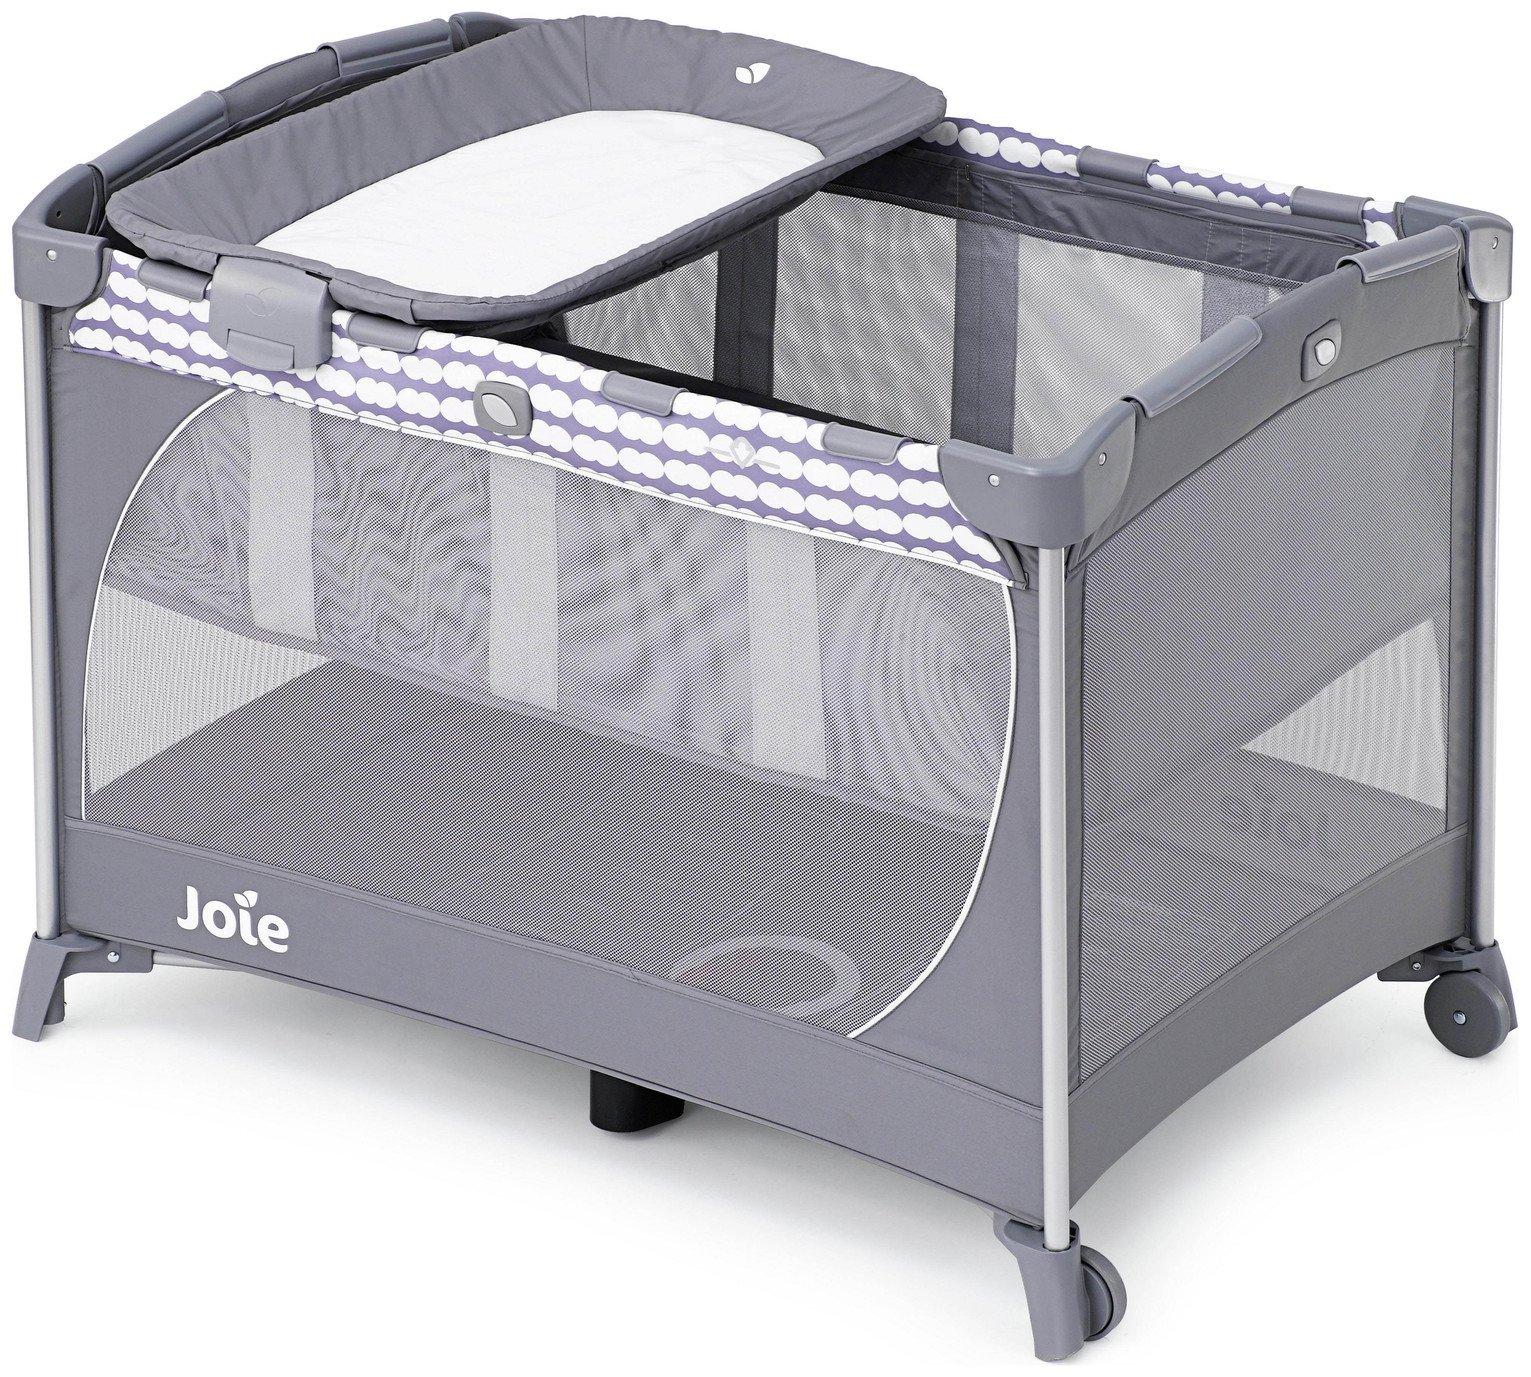 Image of Joie Commuter Change Travel Cot - Cloud